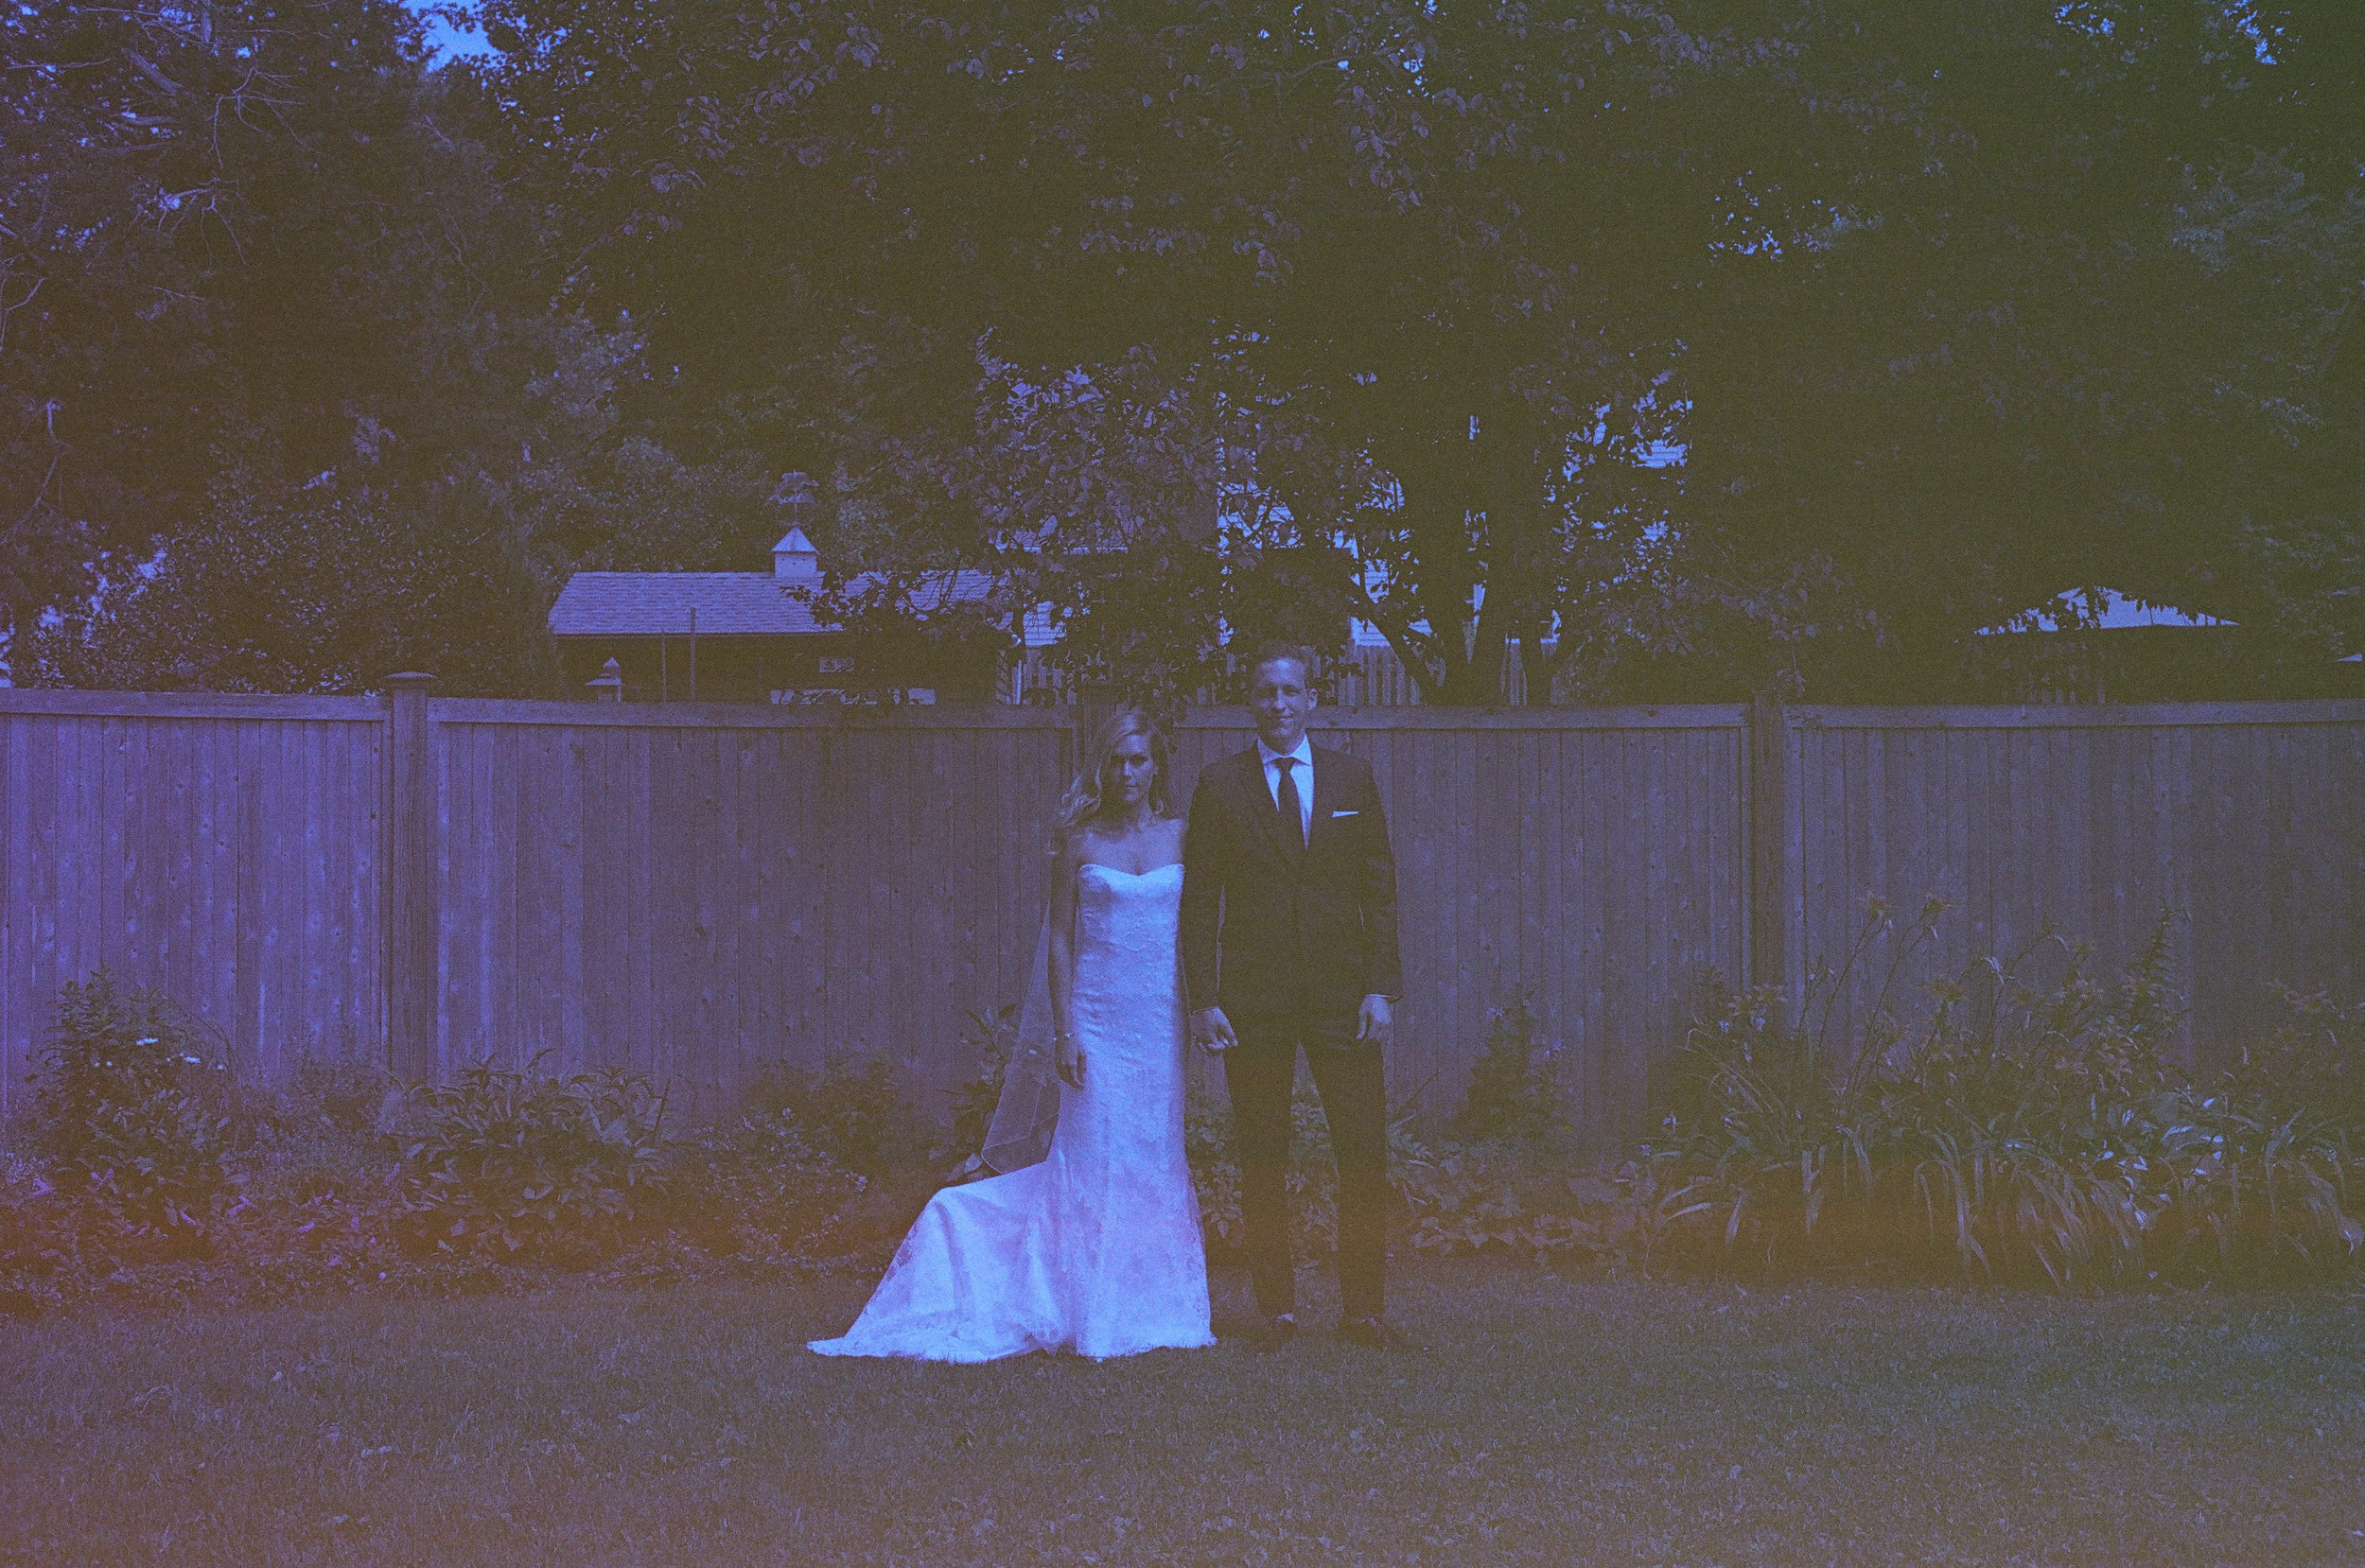 ROWAYTON_LIBRARY_WEDDING_35MM_FILM-5015.jpg